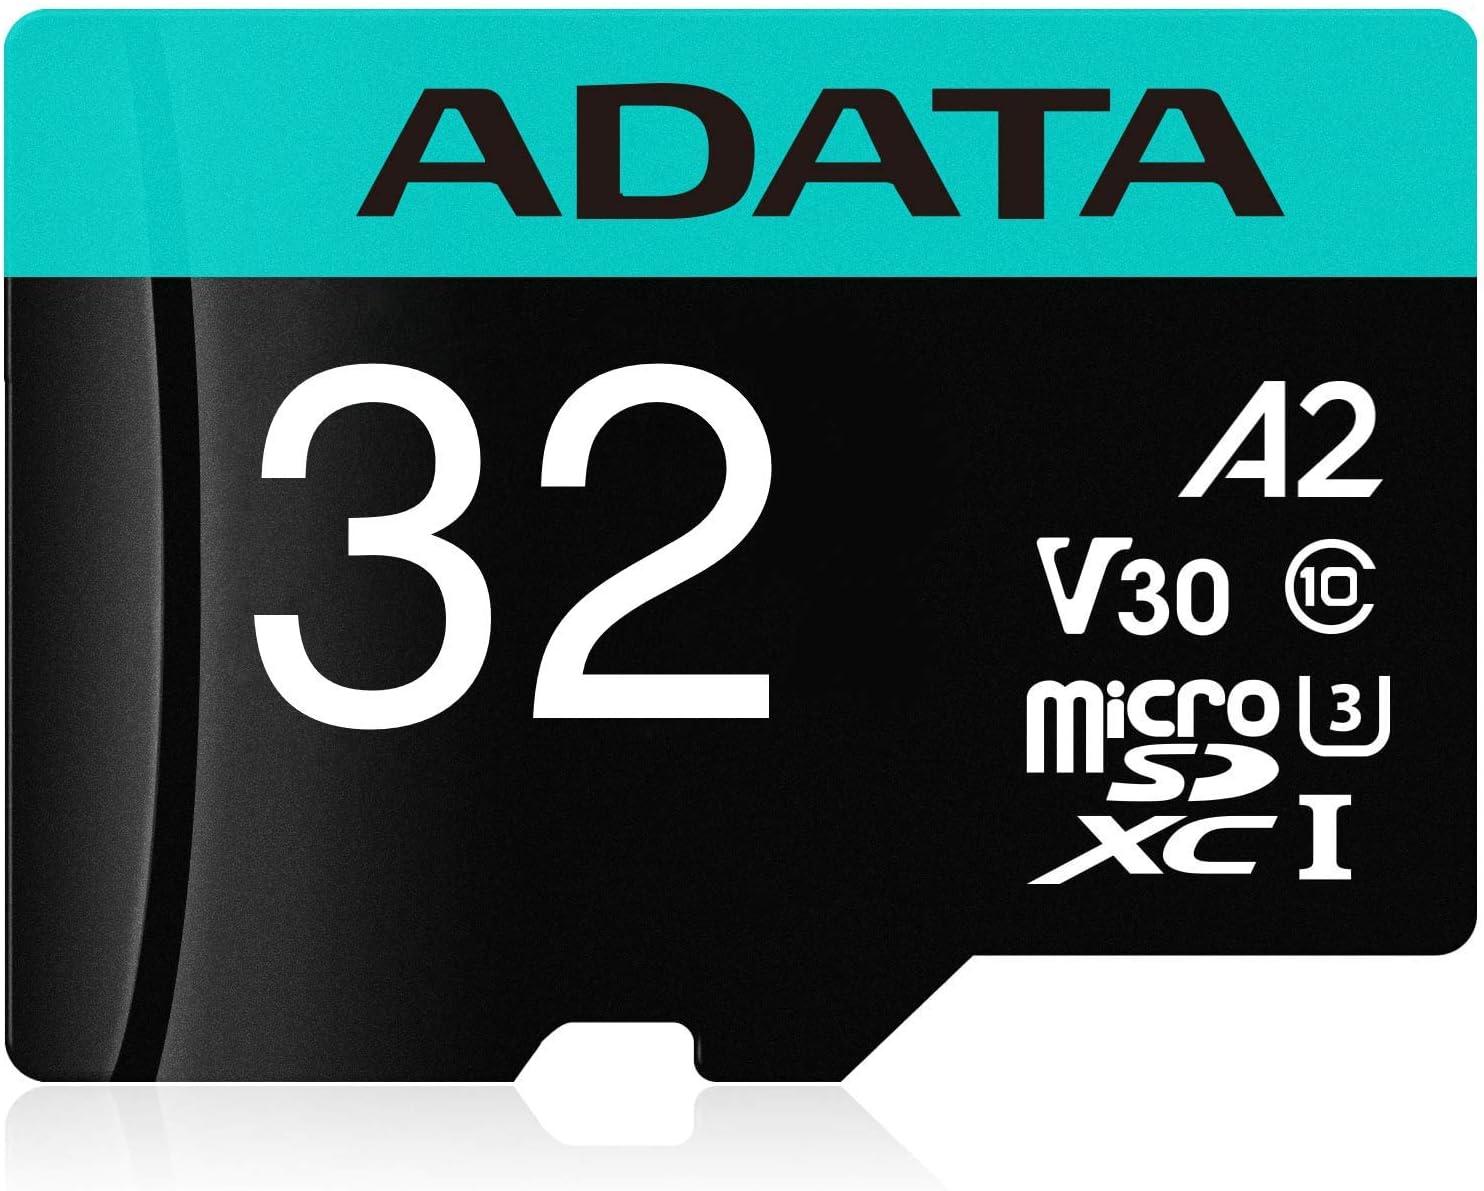 Adata Premier Pro 32gb Microsdxc Sdhc Uhs I U3 Class 10 V30s